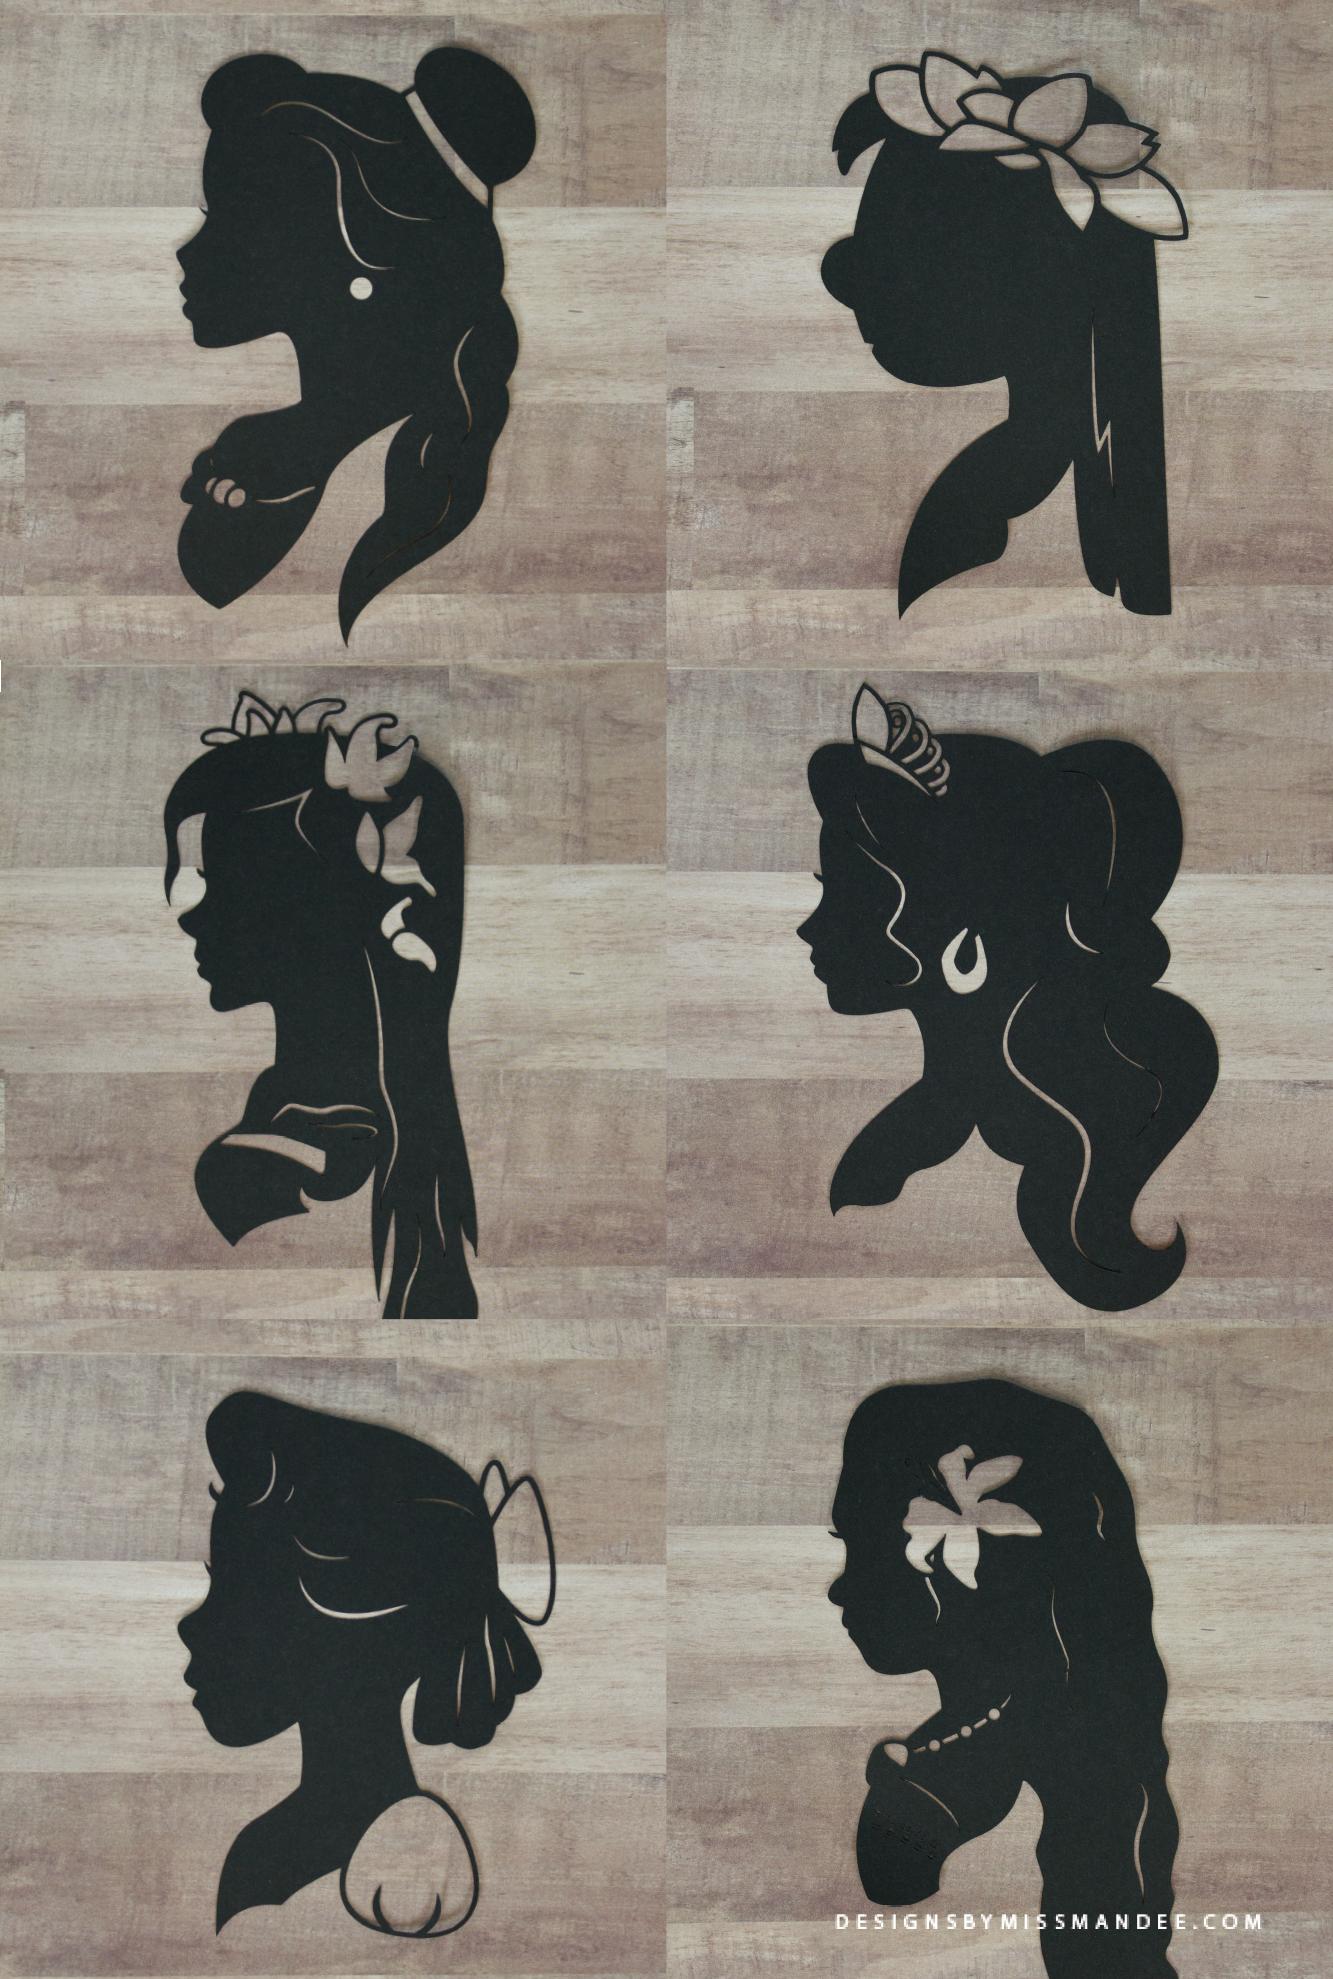 Disney Princess Silhouettes v.4 Pochoir silhouette